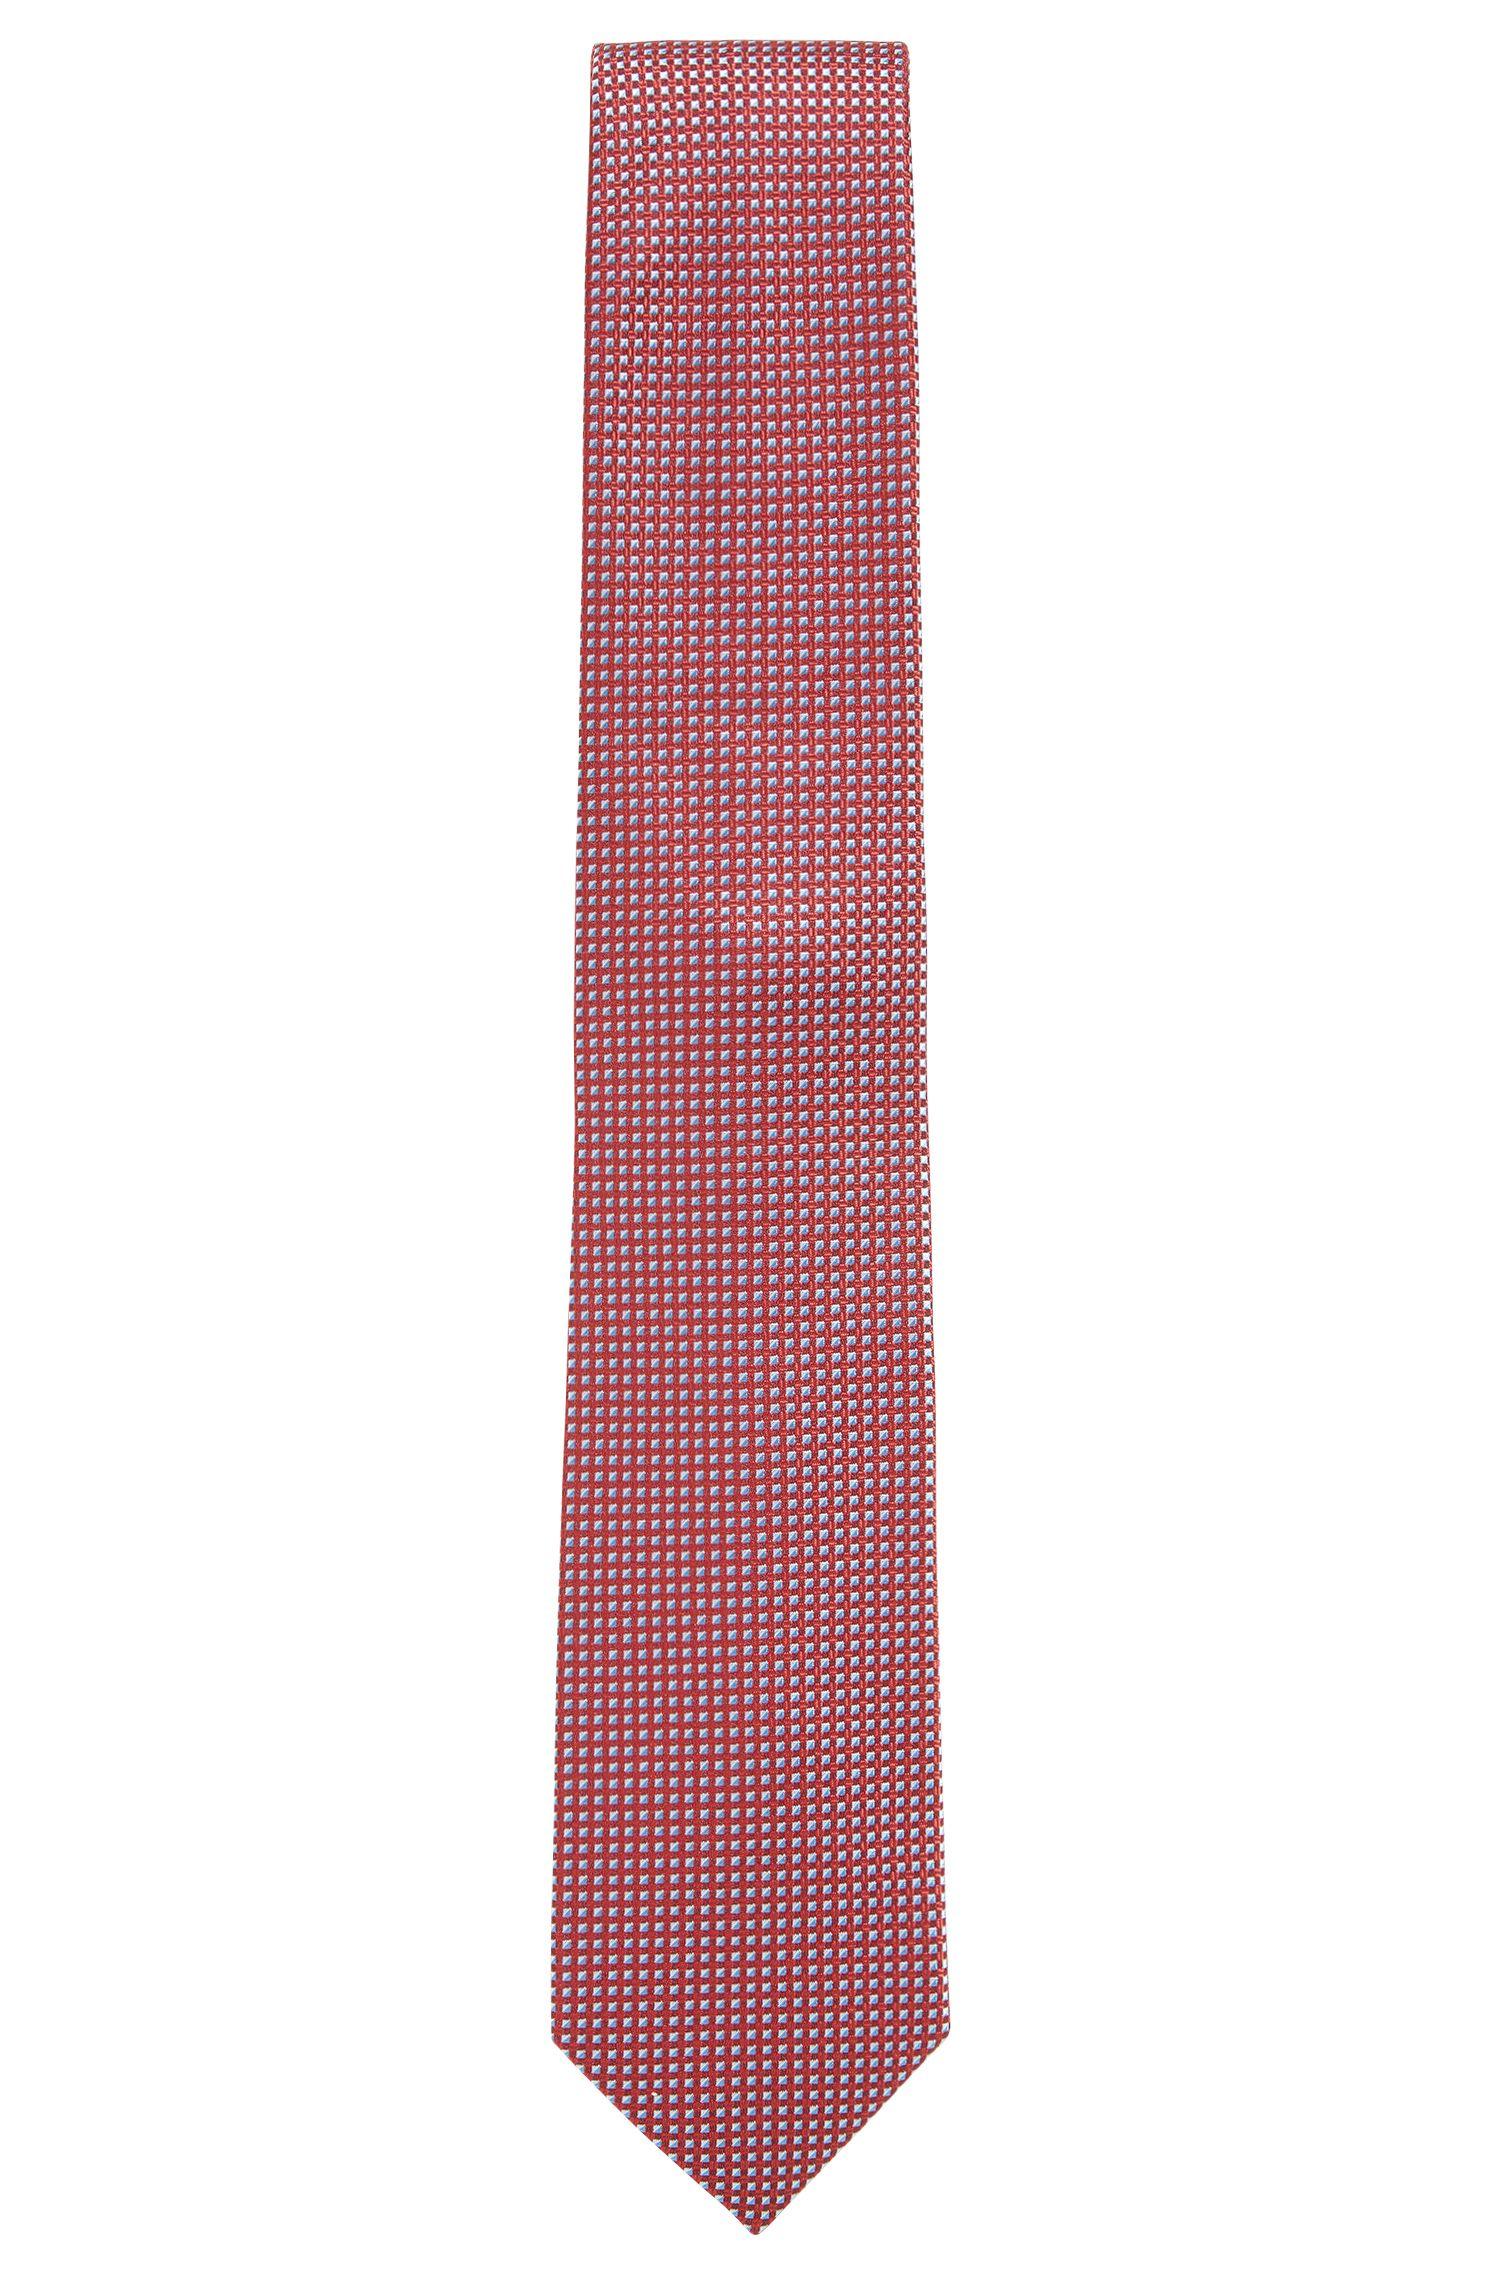 Nailhead Silk Tie, Regular | Tie 7.5 cm